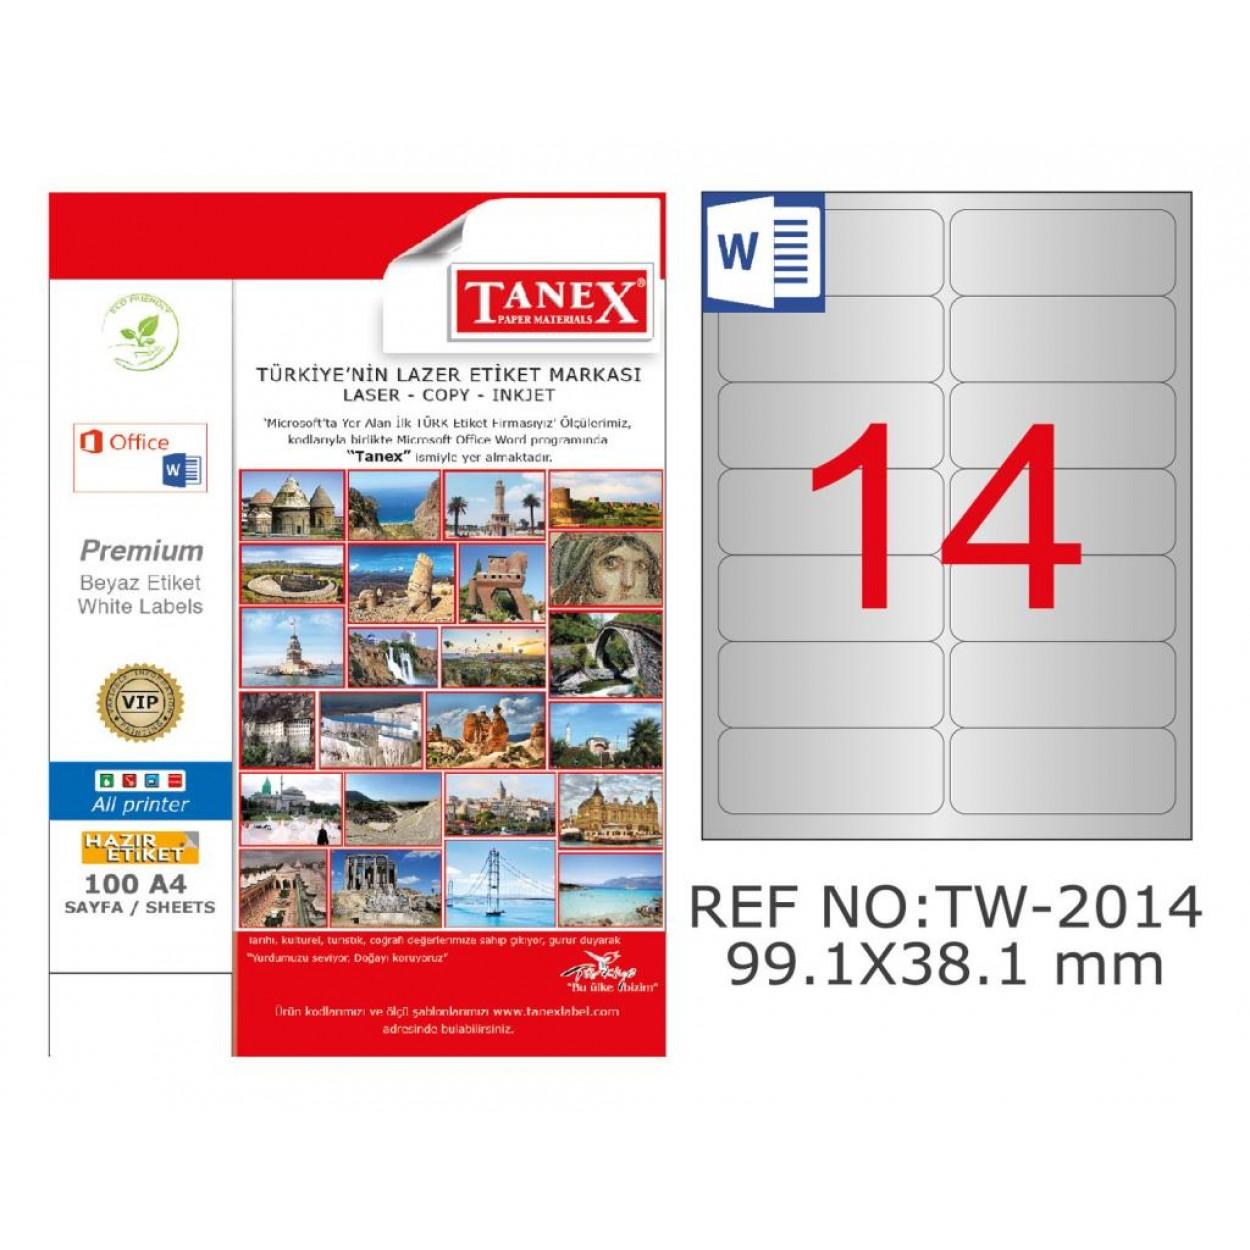 Tanex TW-2014 99.1x38.1mm Gümüş Lazer Etiket 350 Li